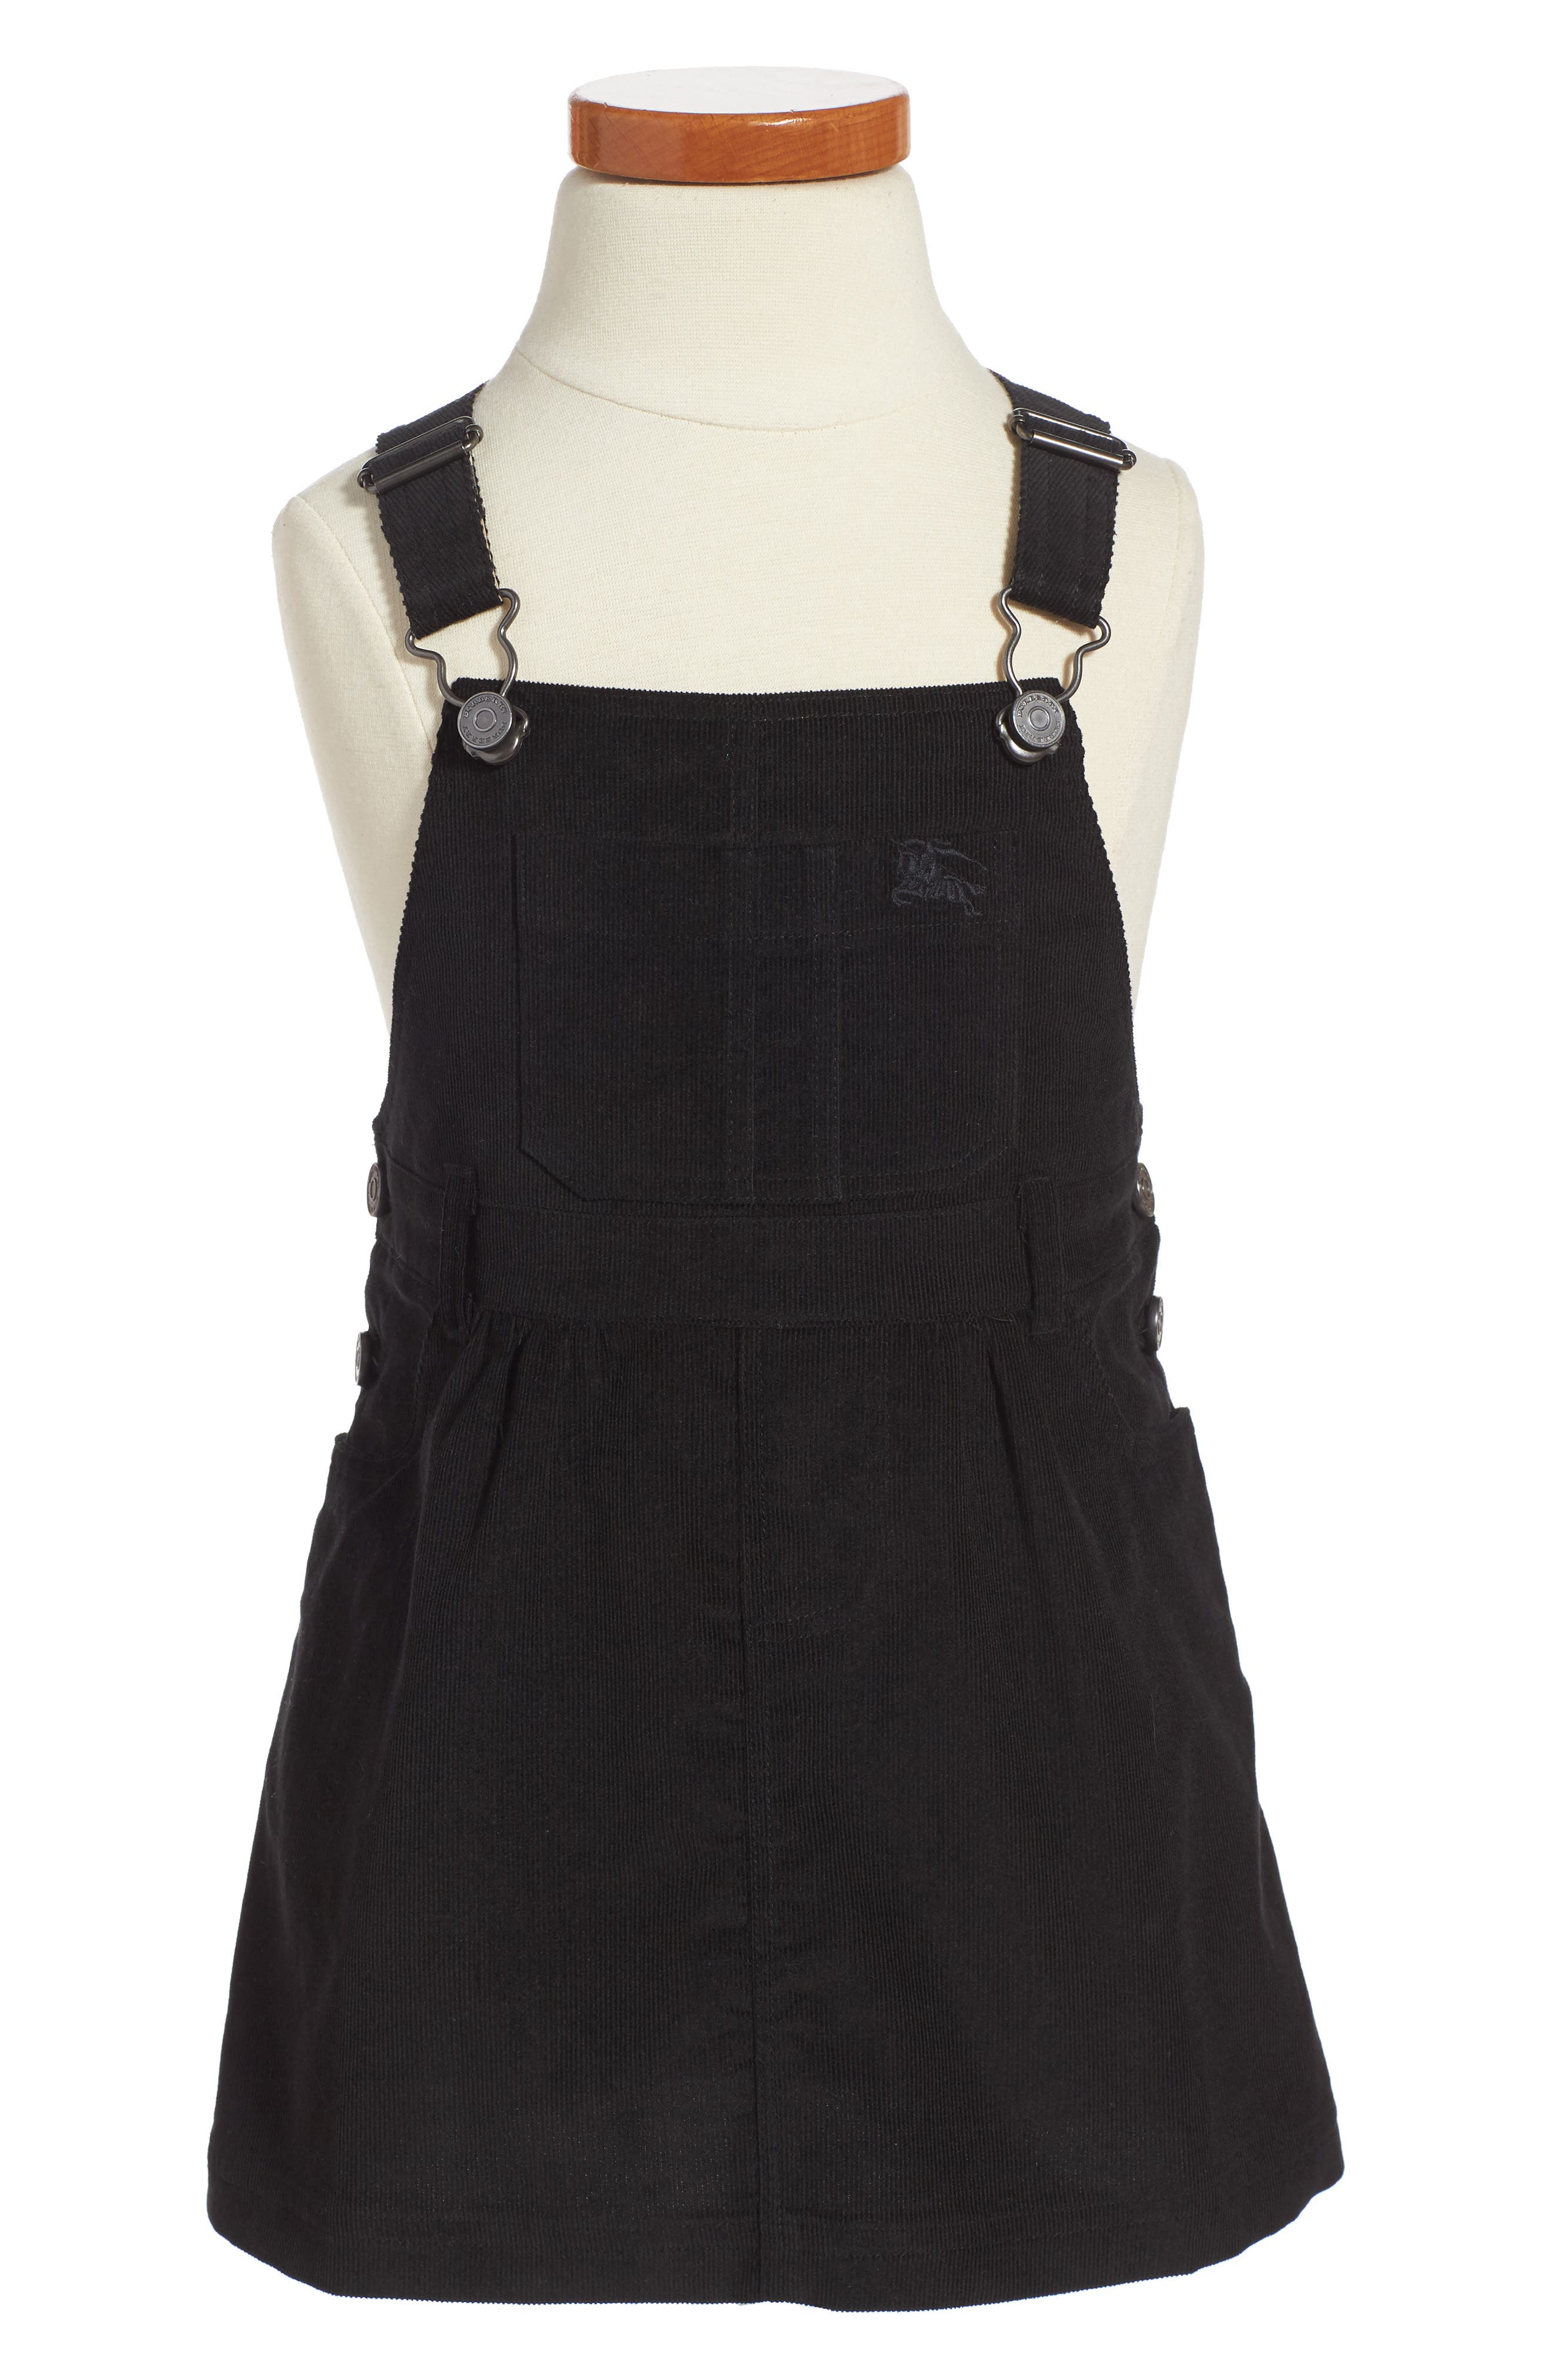 Burberry Wilma Overalls Dress (Toddler Girls)